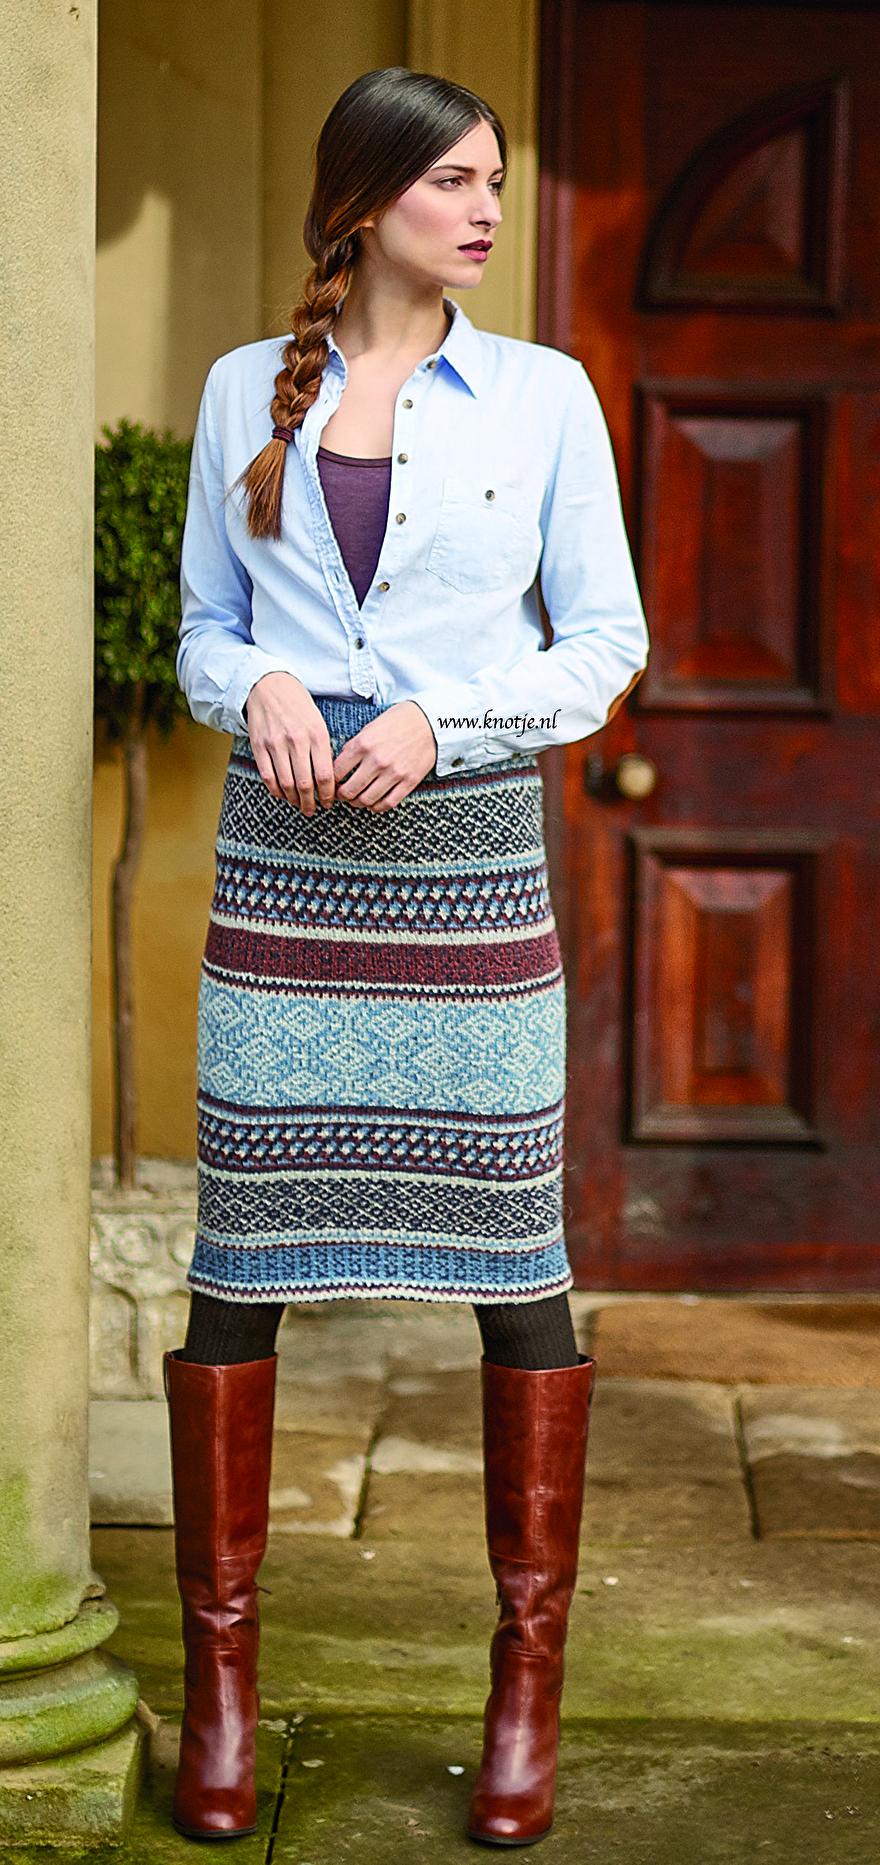 Balfour Skirt 1kopie.jpg